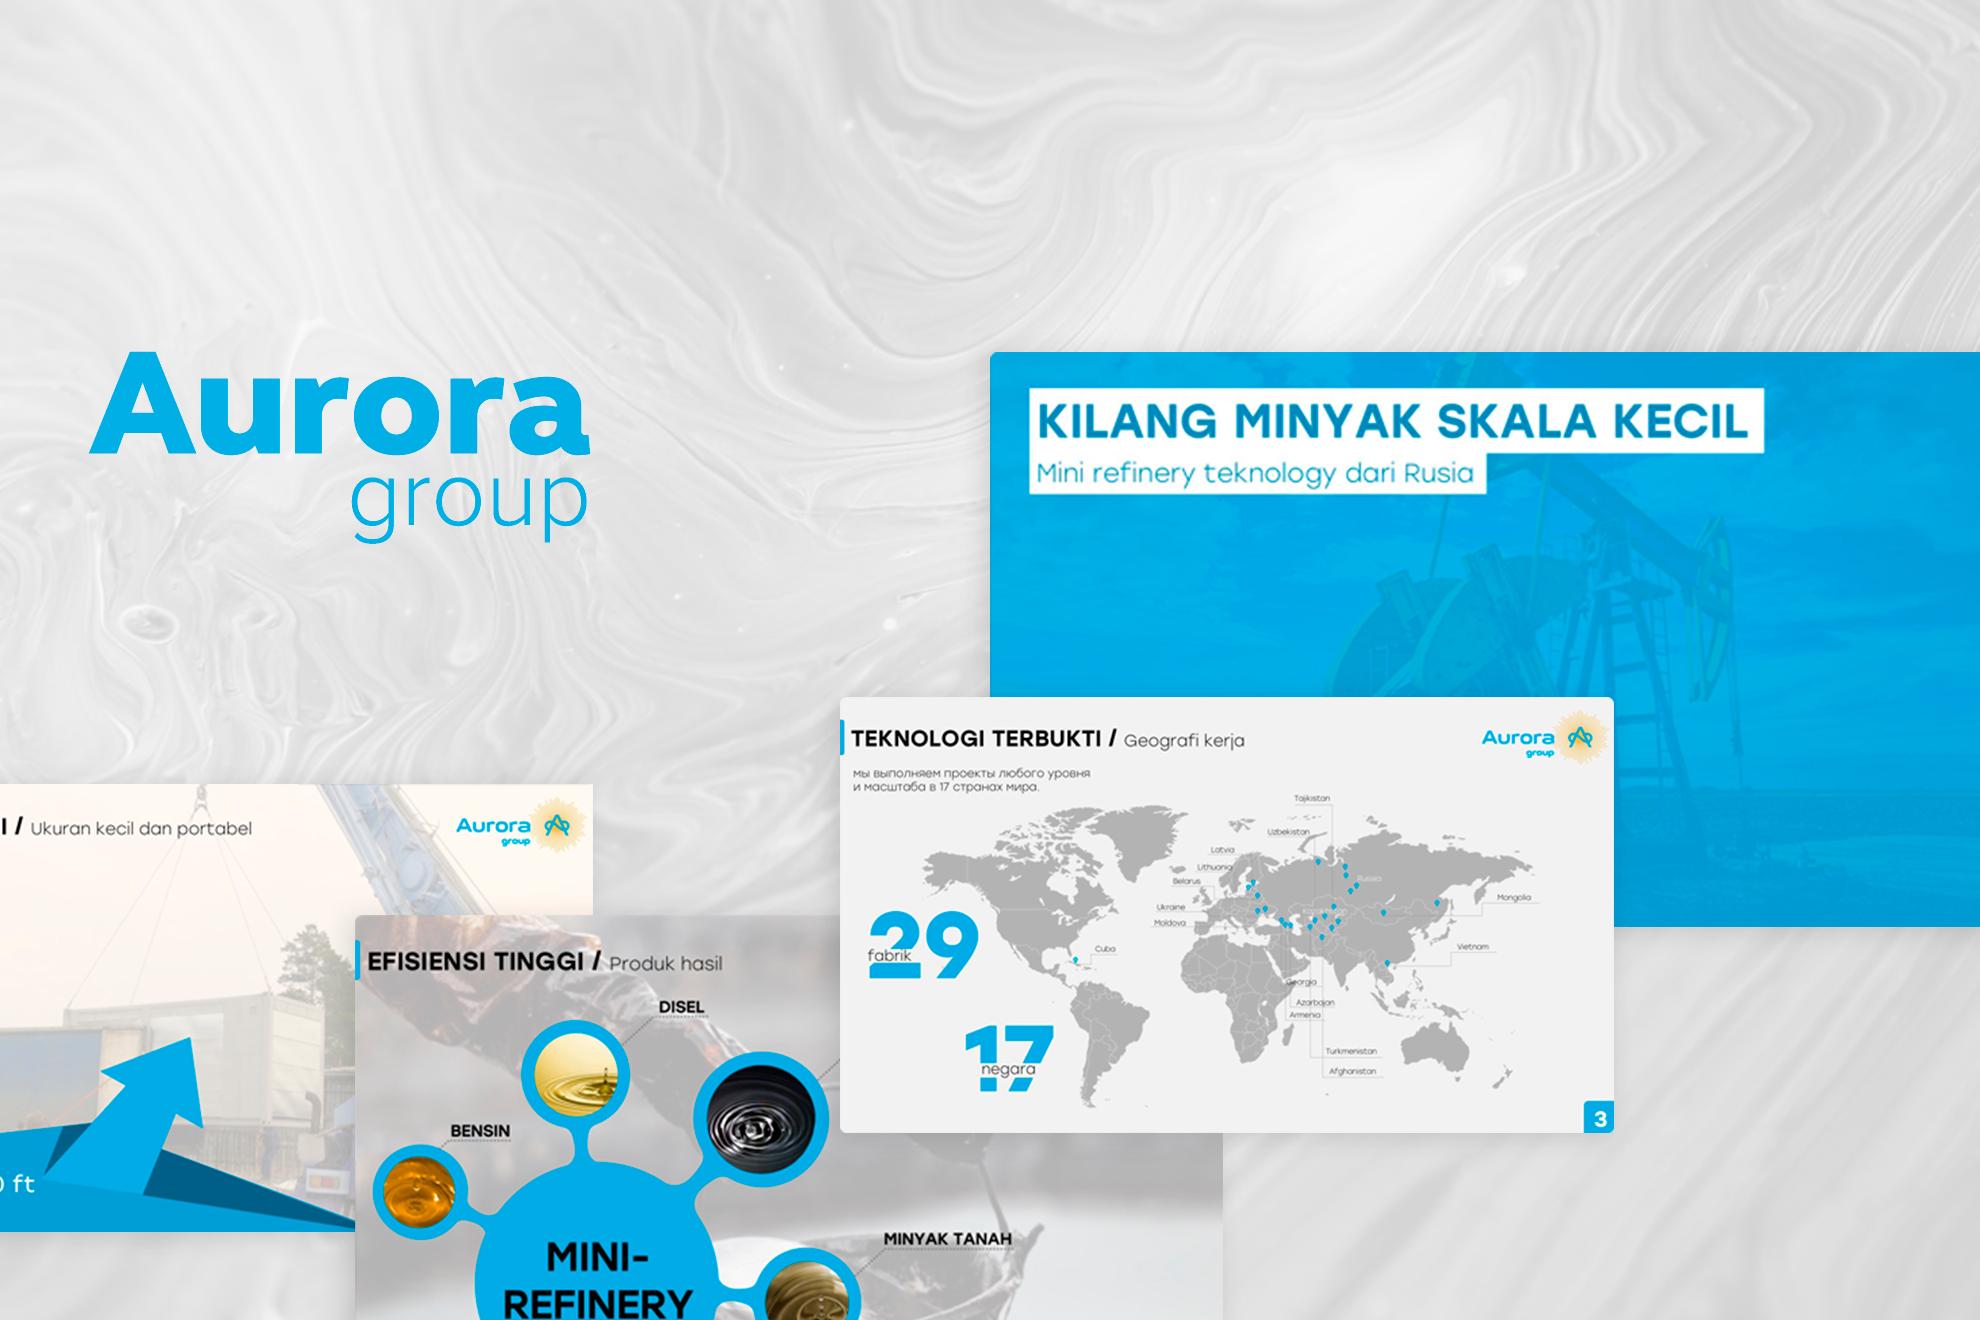 Aurora group // Презентация мини-нефтянного завода (Indonesia)